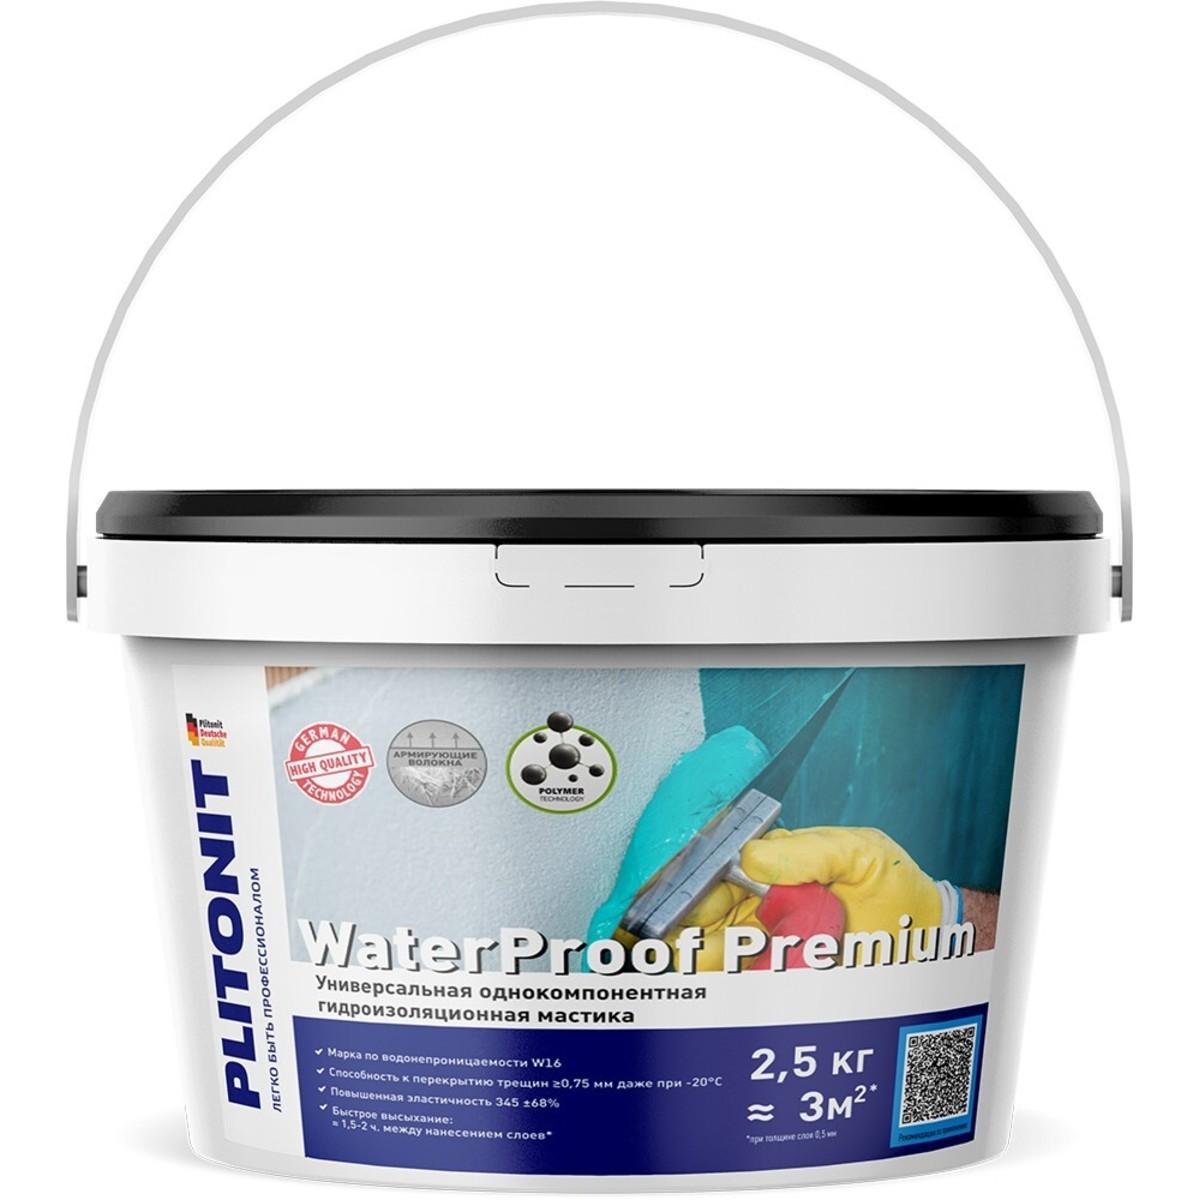 Гидроизоляция Plitonit WaterProof Premium 2.5 кг